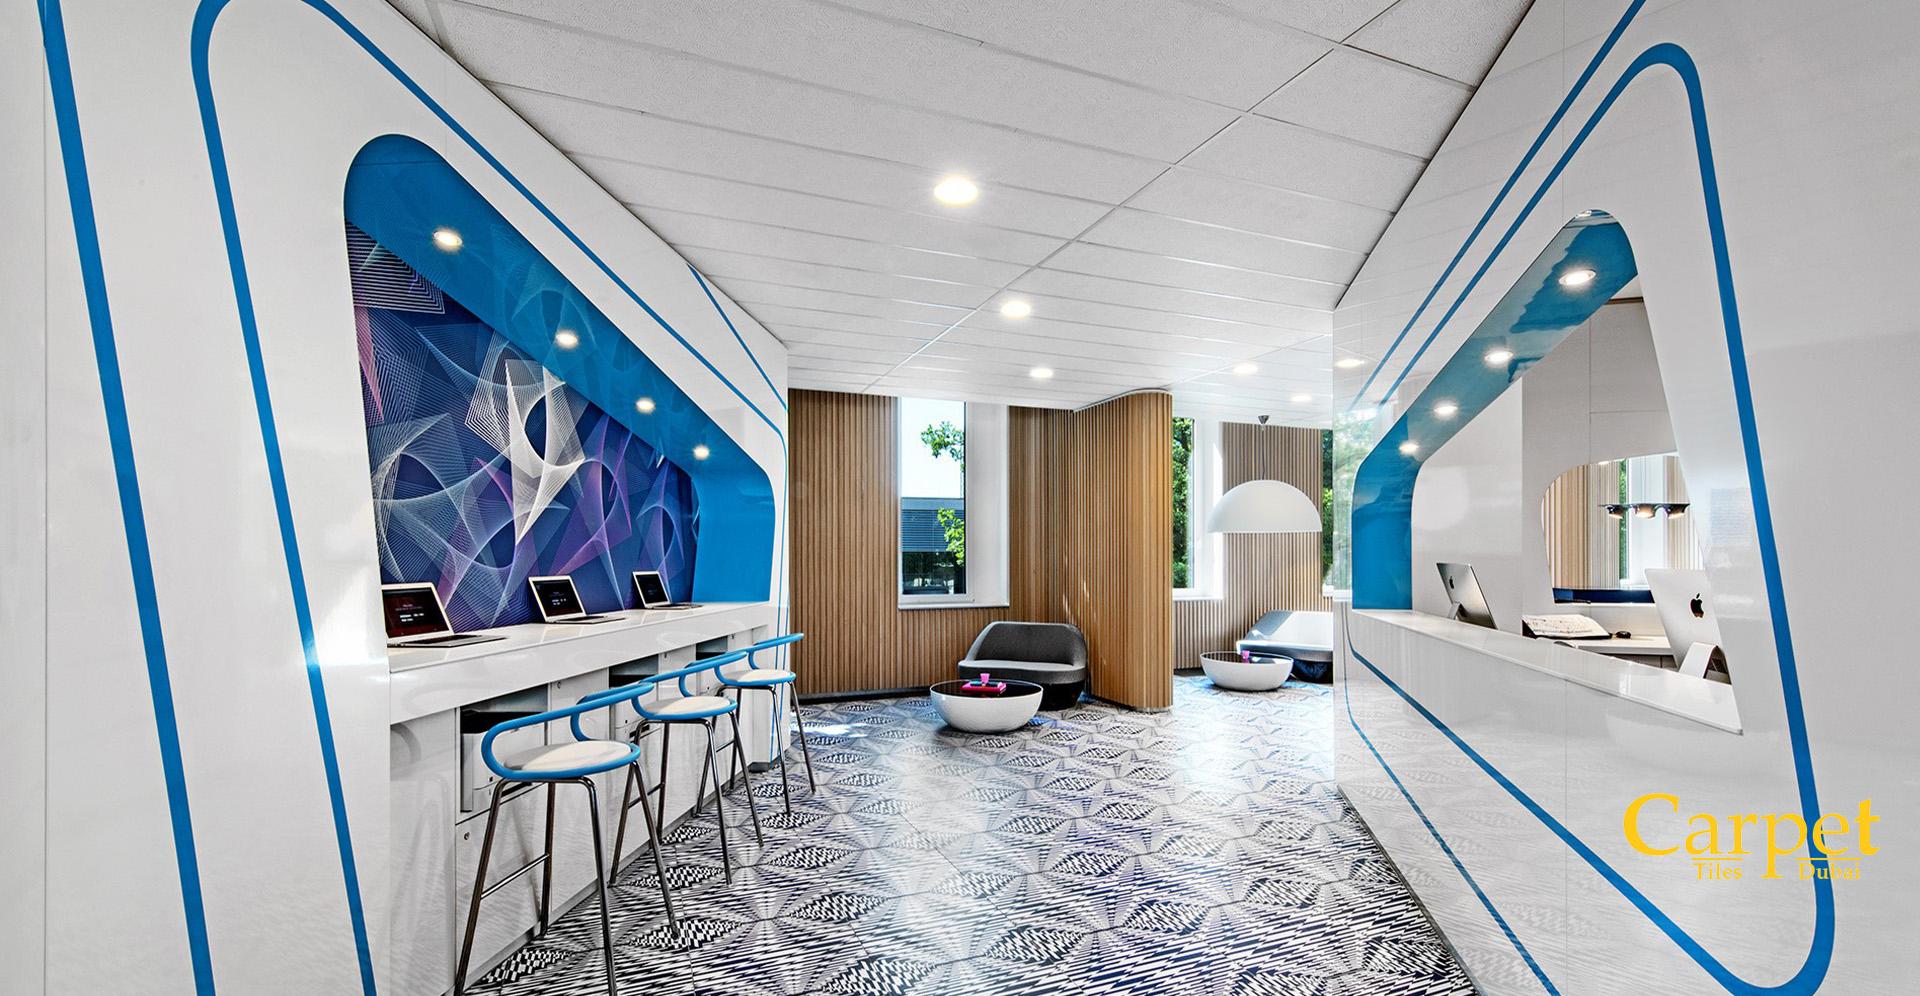 floor designs unlimited llc - Baser